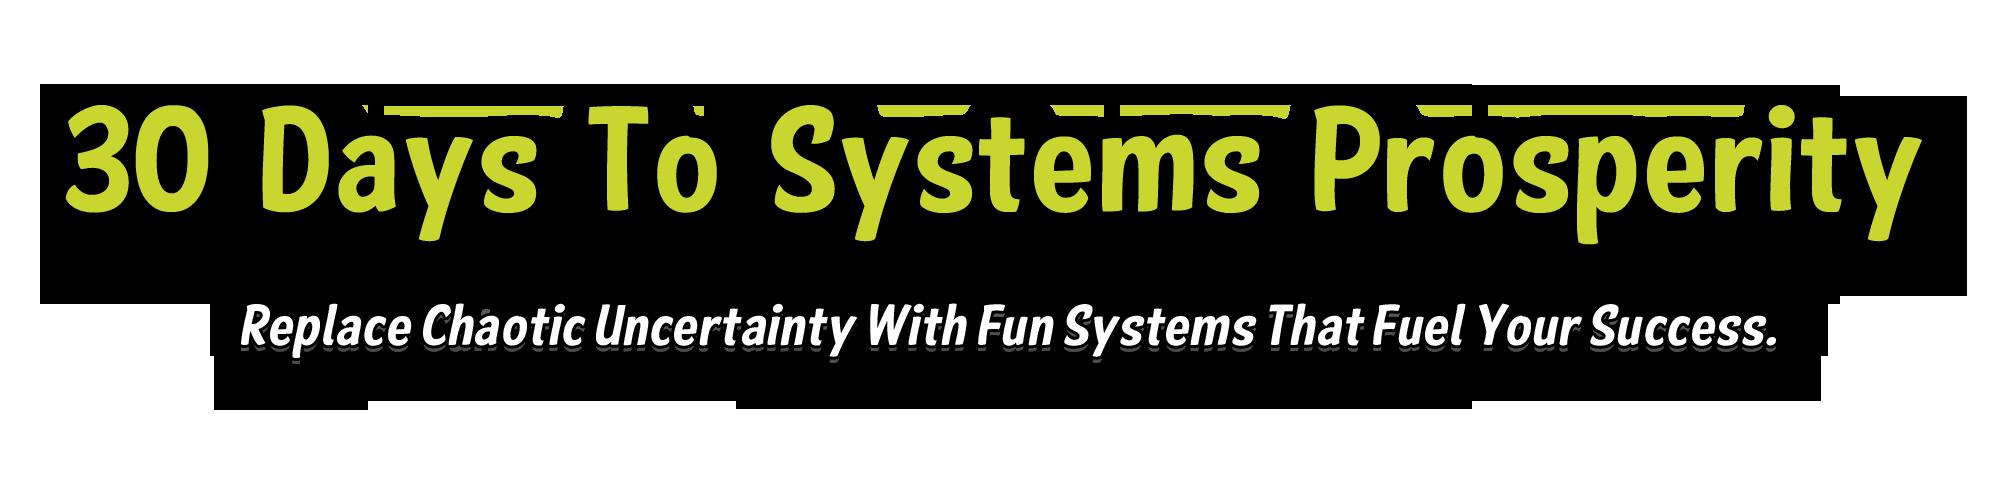 30 Days to Systems Prosperity